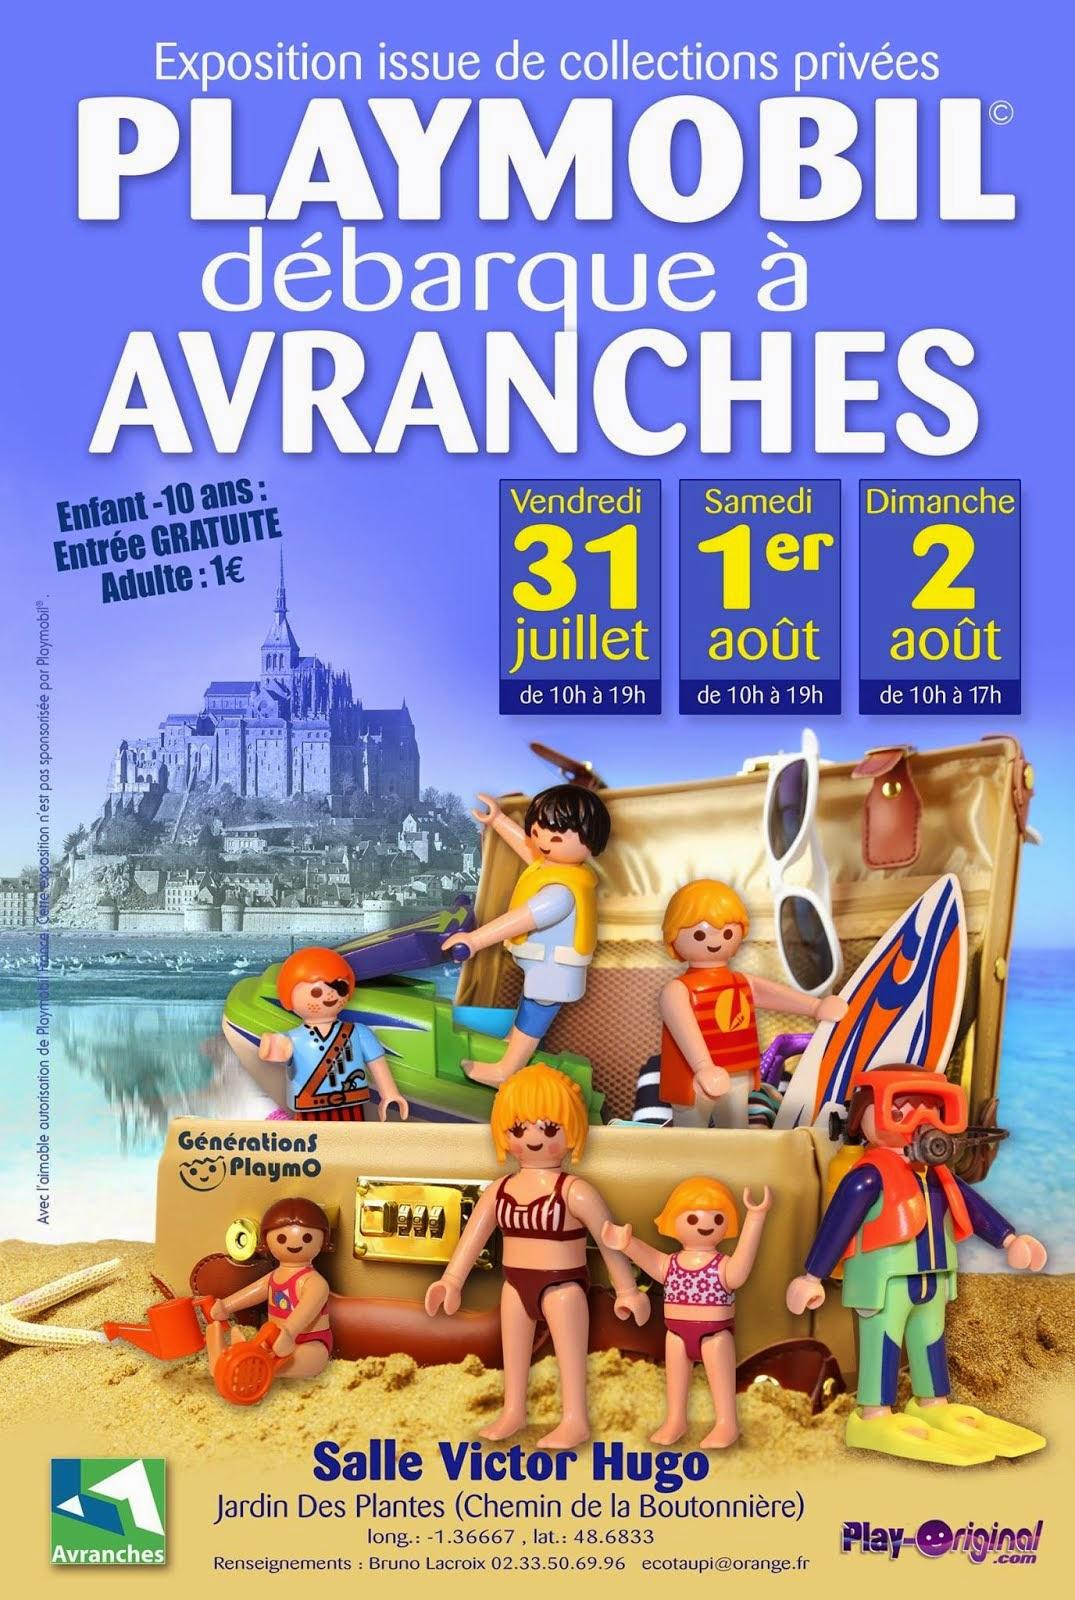 Expo-vente Avranches, 31 juillet, 1er et 2 Août 2015